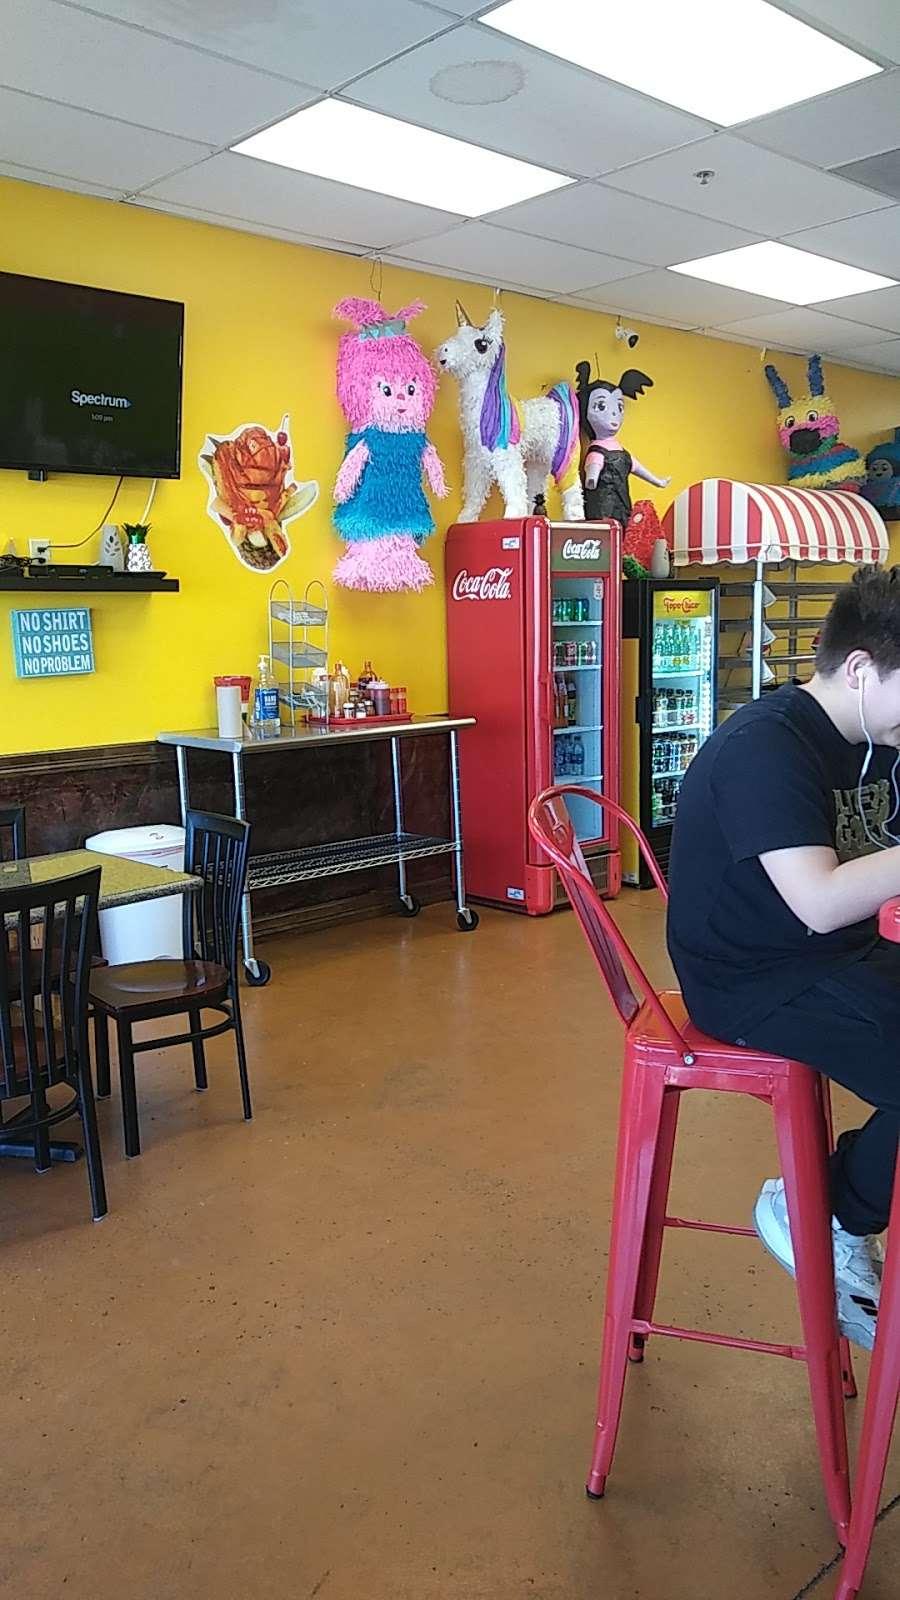 La Pina Fruteria - cafe    Photo 3 of 9   Address: 9902 Potranco Rd, San Antonio, TX 78251, USA   Phone: (210) 281-4573